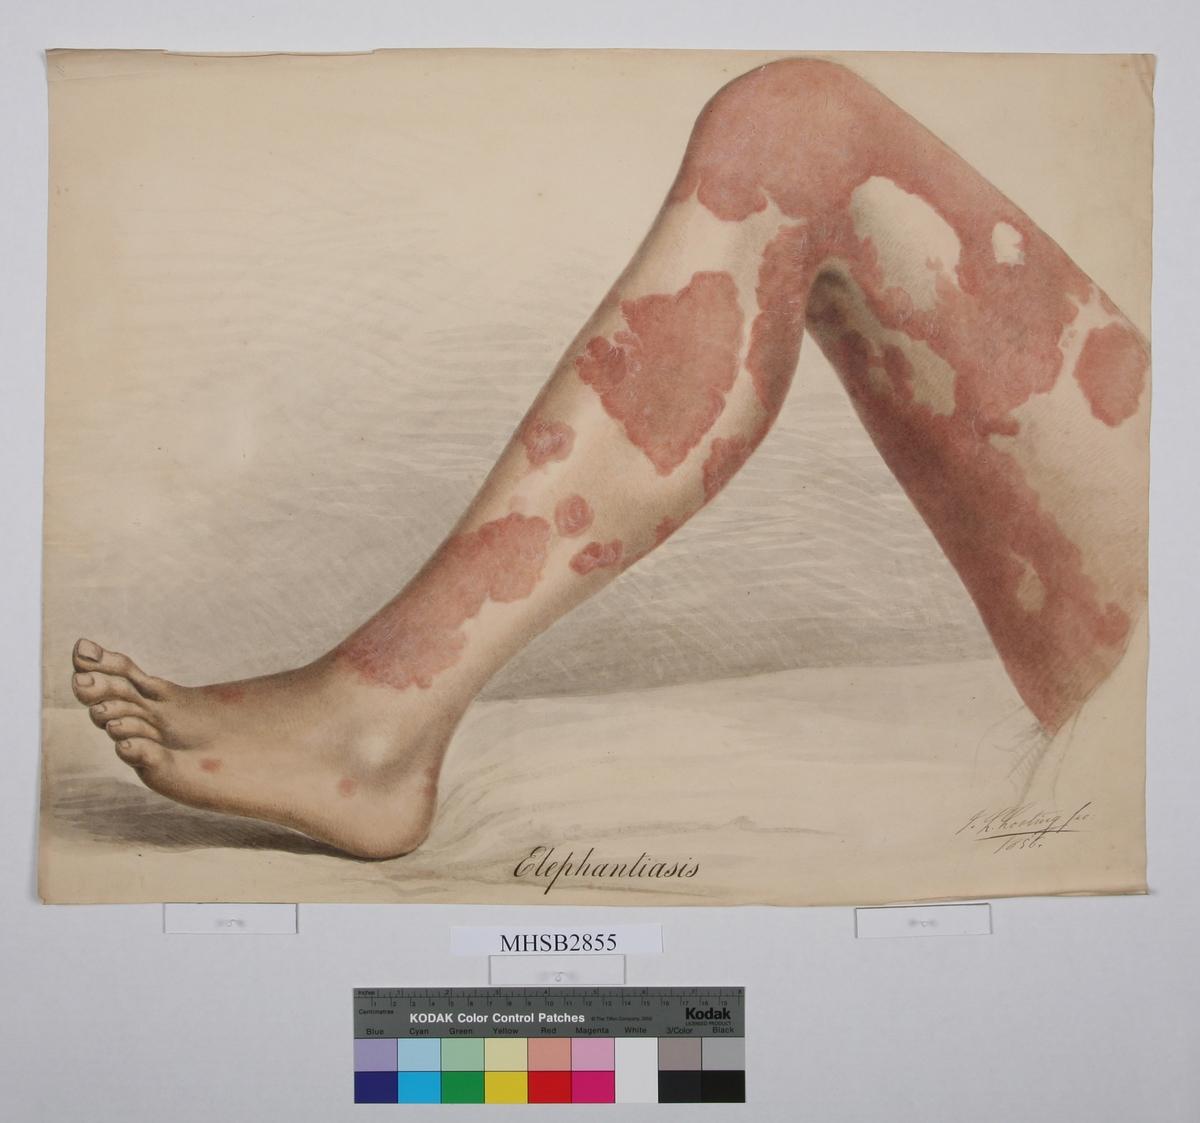 Venstre bein, pasient med Elephanitiasis